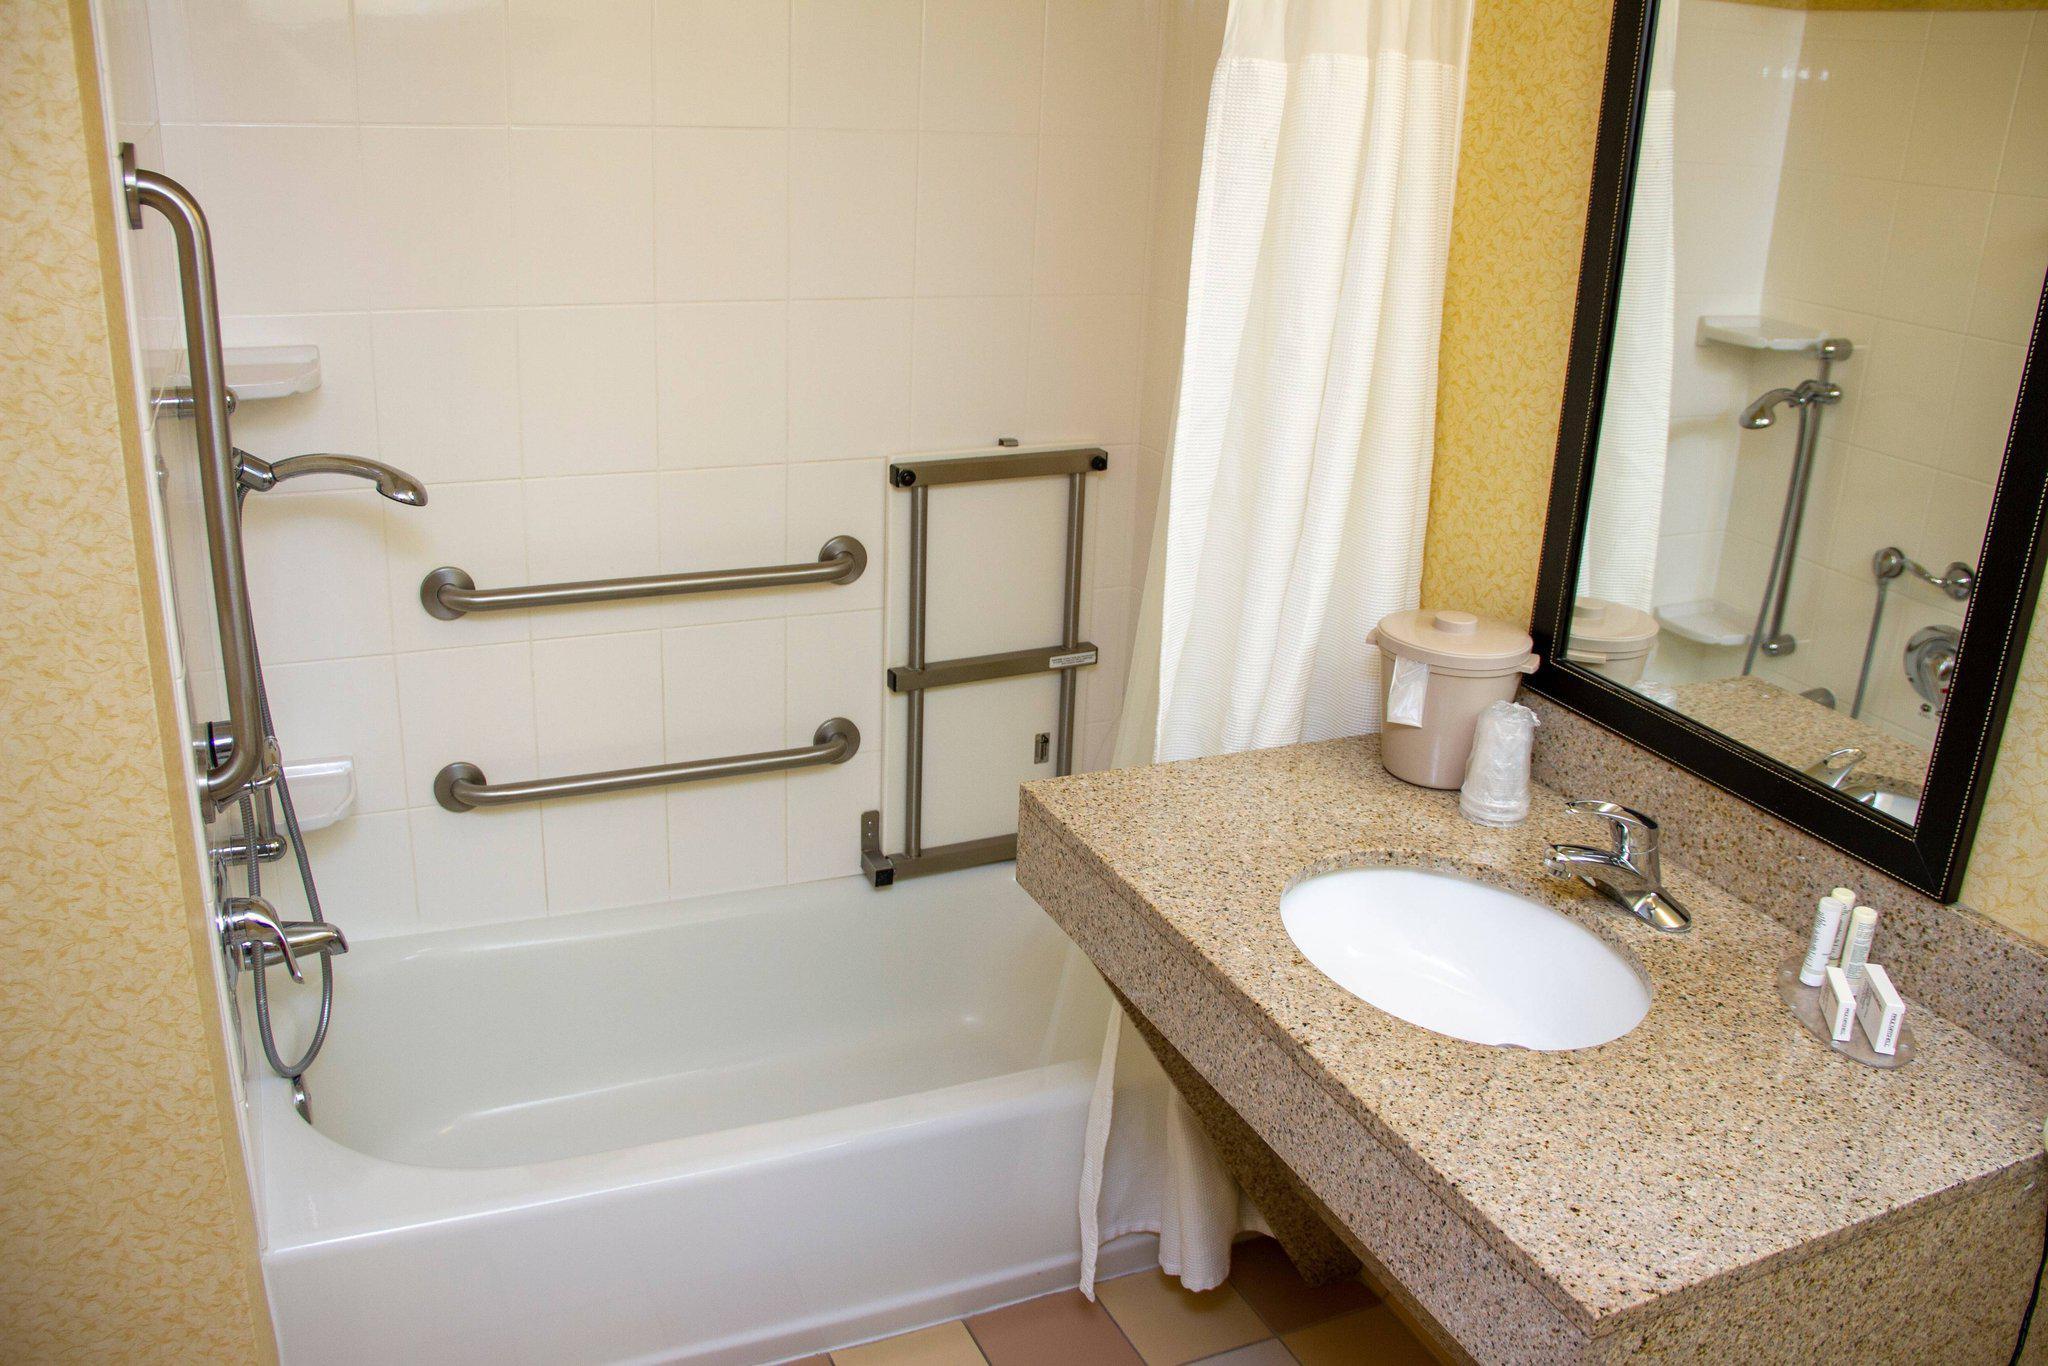 Fairfield Inn & Suites by Marriott Fort Walton Beach-Eglin AFB